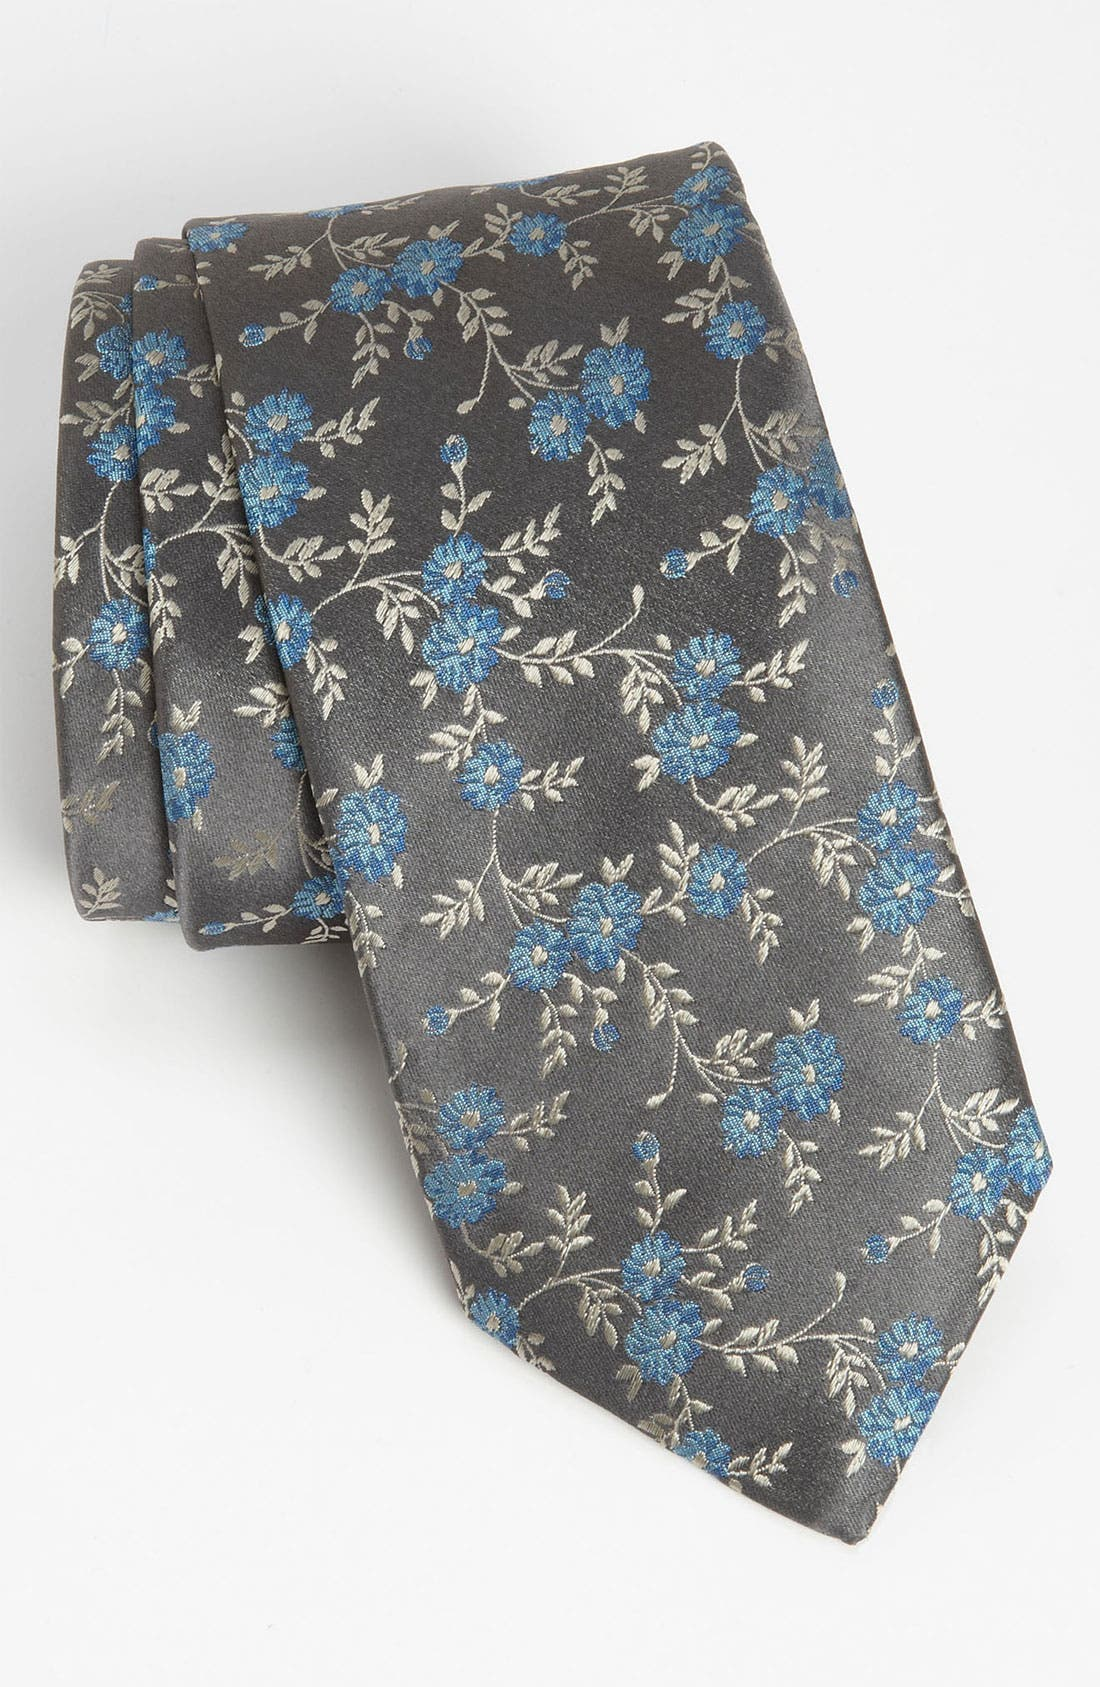 Alternate Image 1 Selected - Thomas Pink 'Frances Flower' Woven Silk Tie